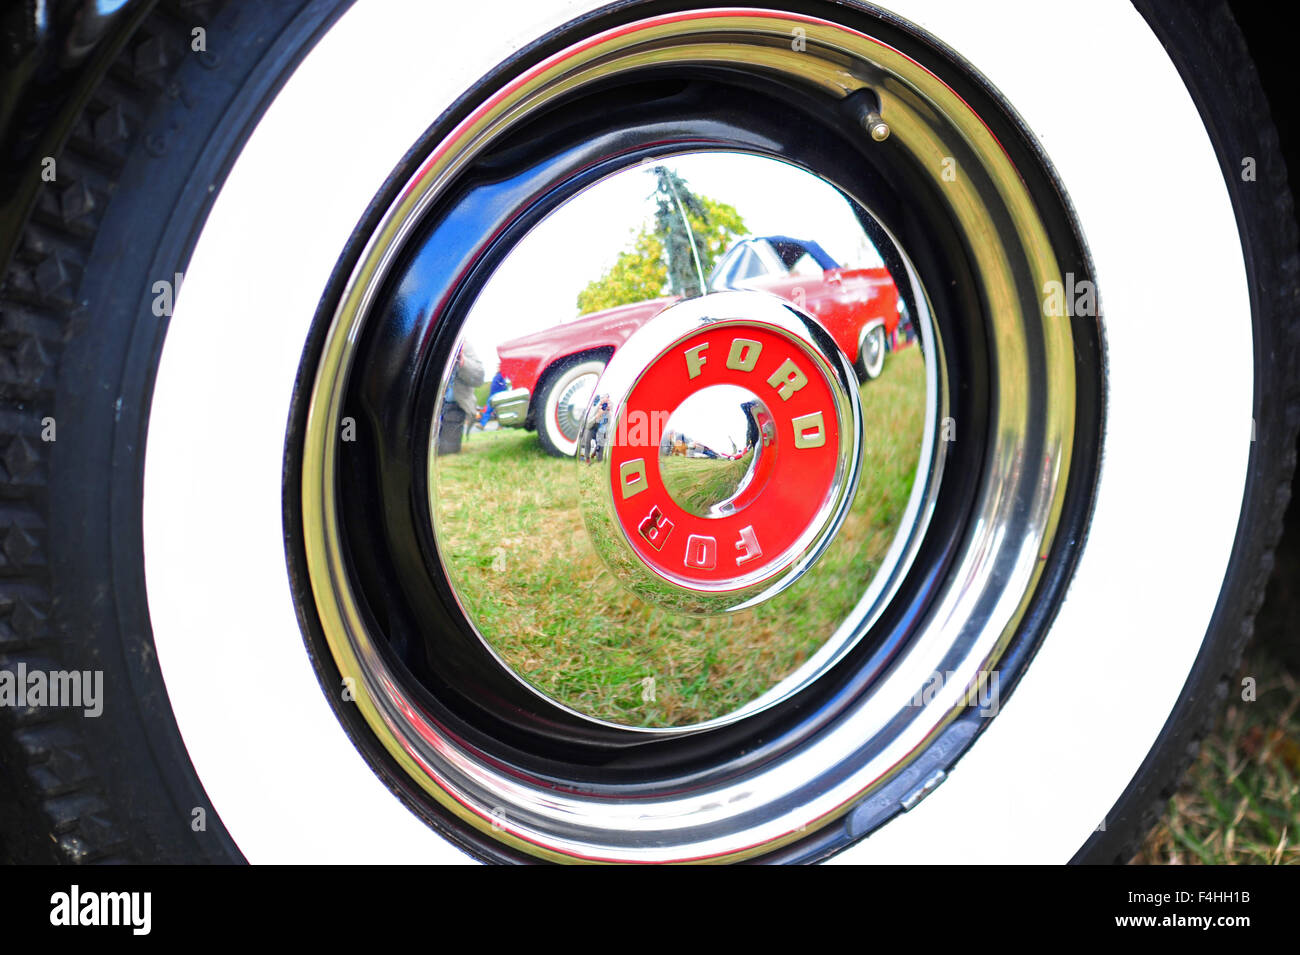 Classic American 1950s era Ford Thunderbirds cars car at an ...